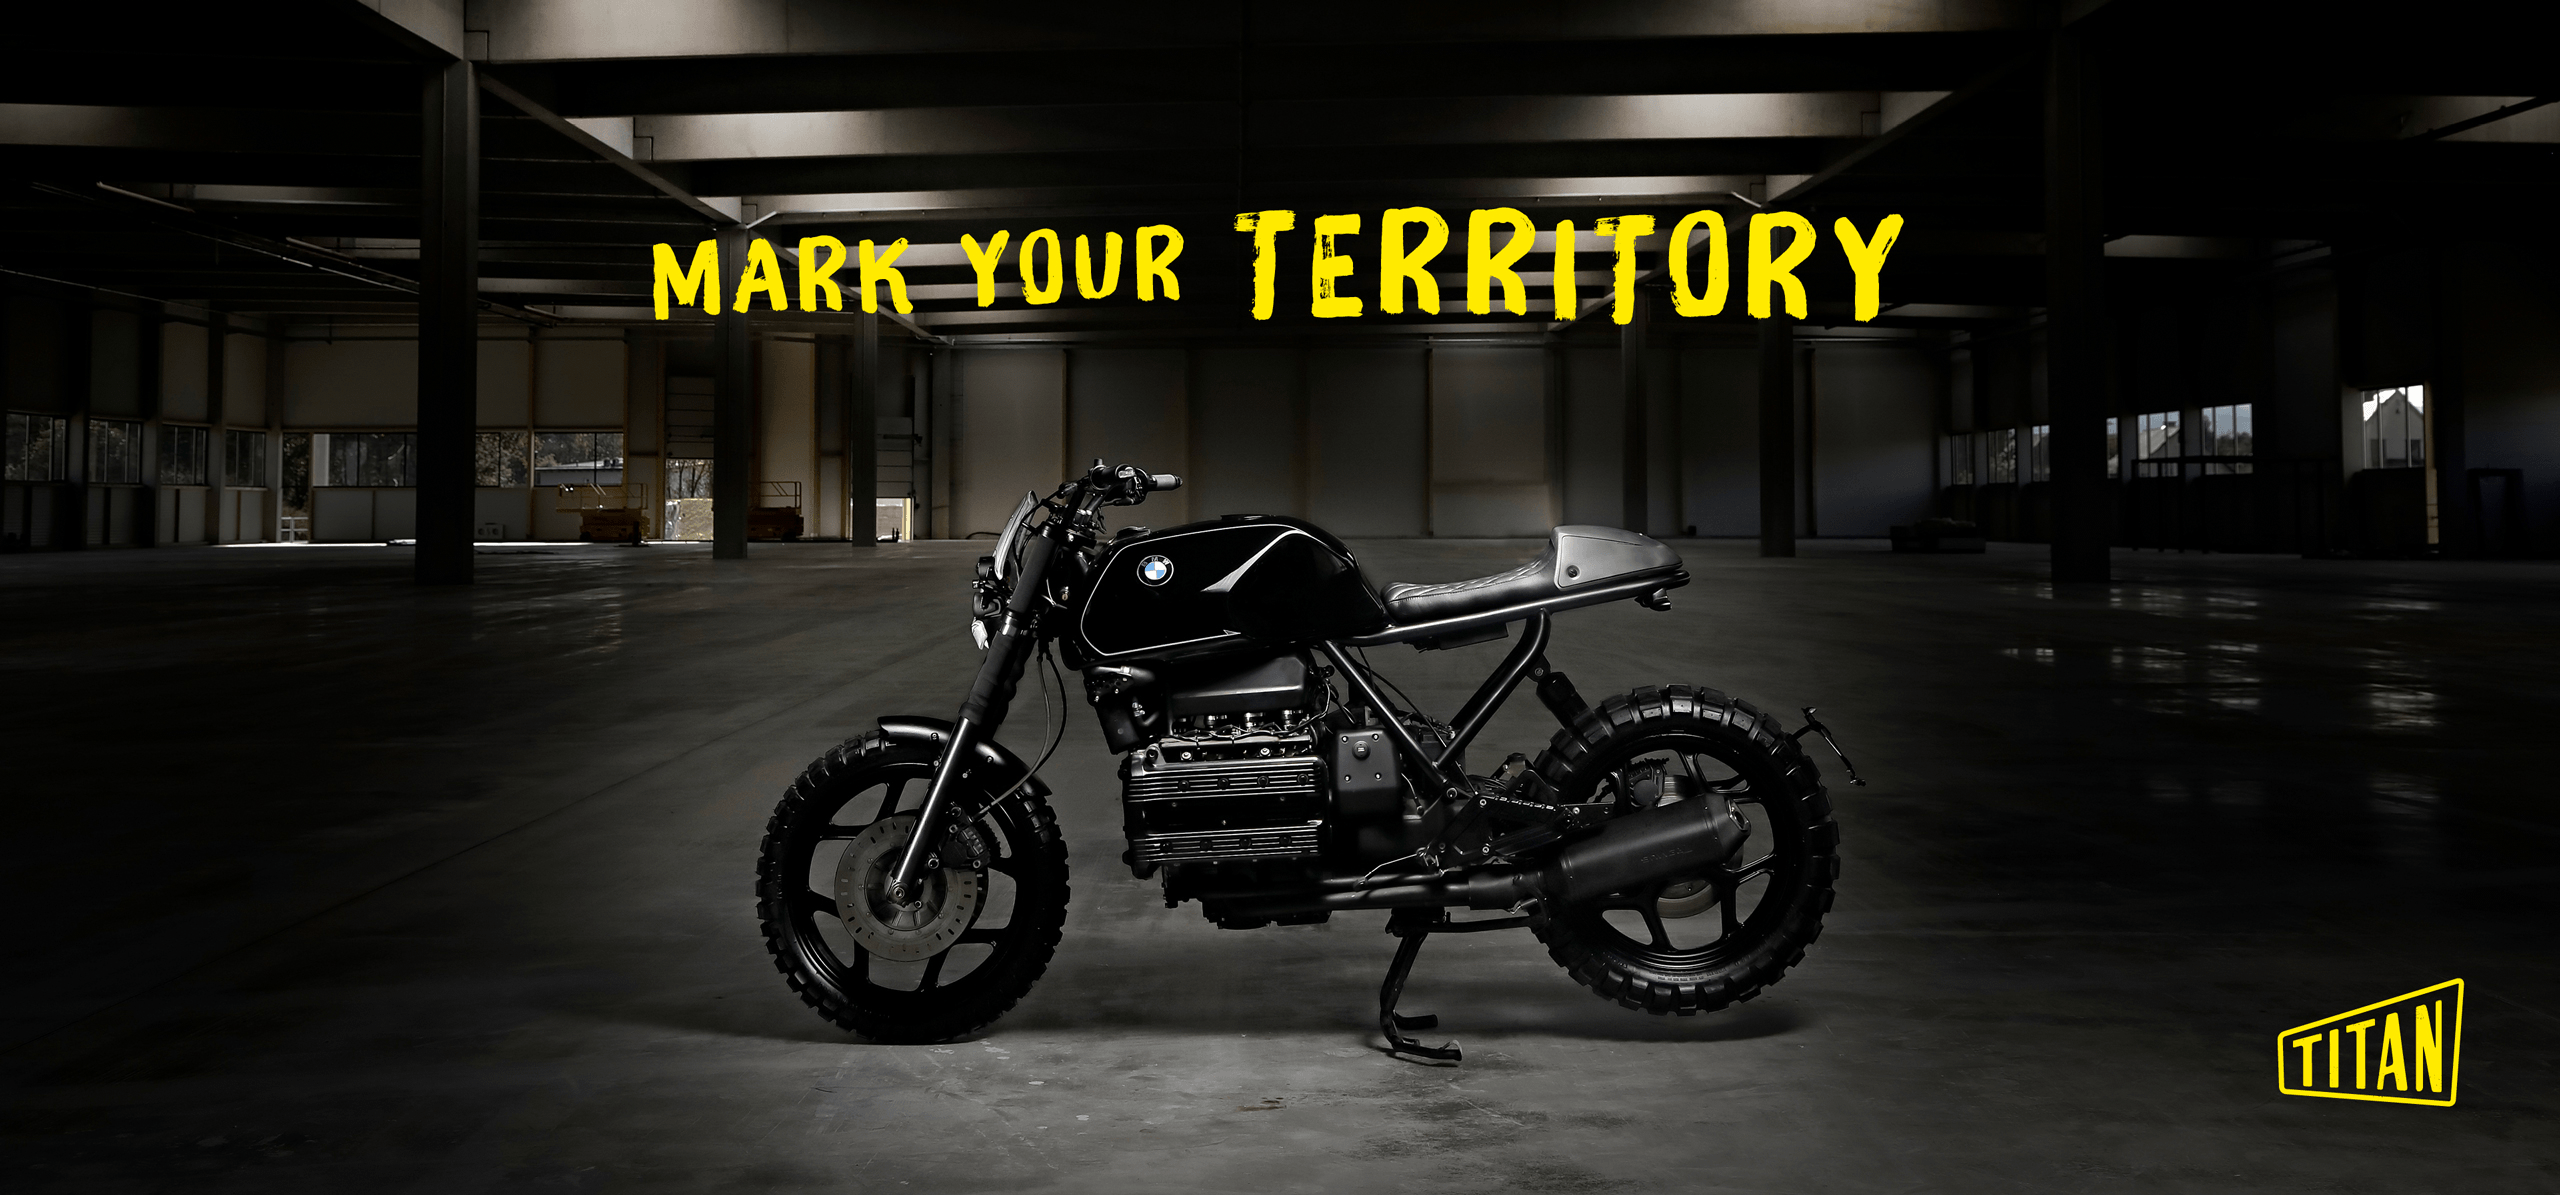 Titan Motorcycles Fotografie Claim